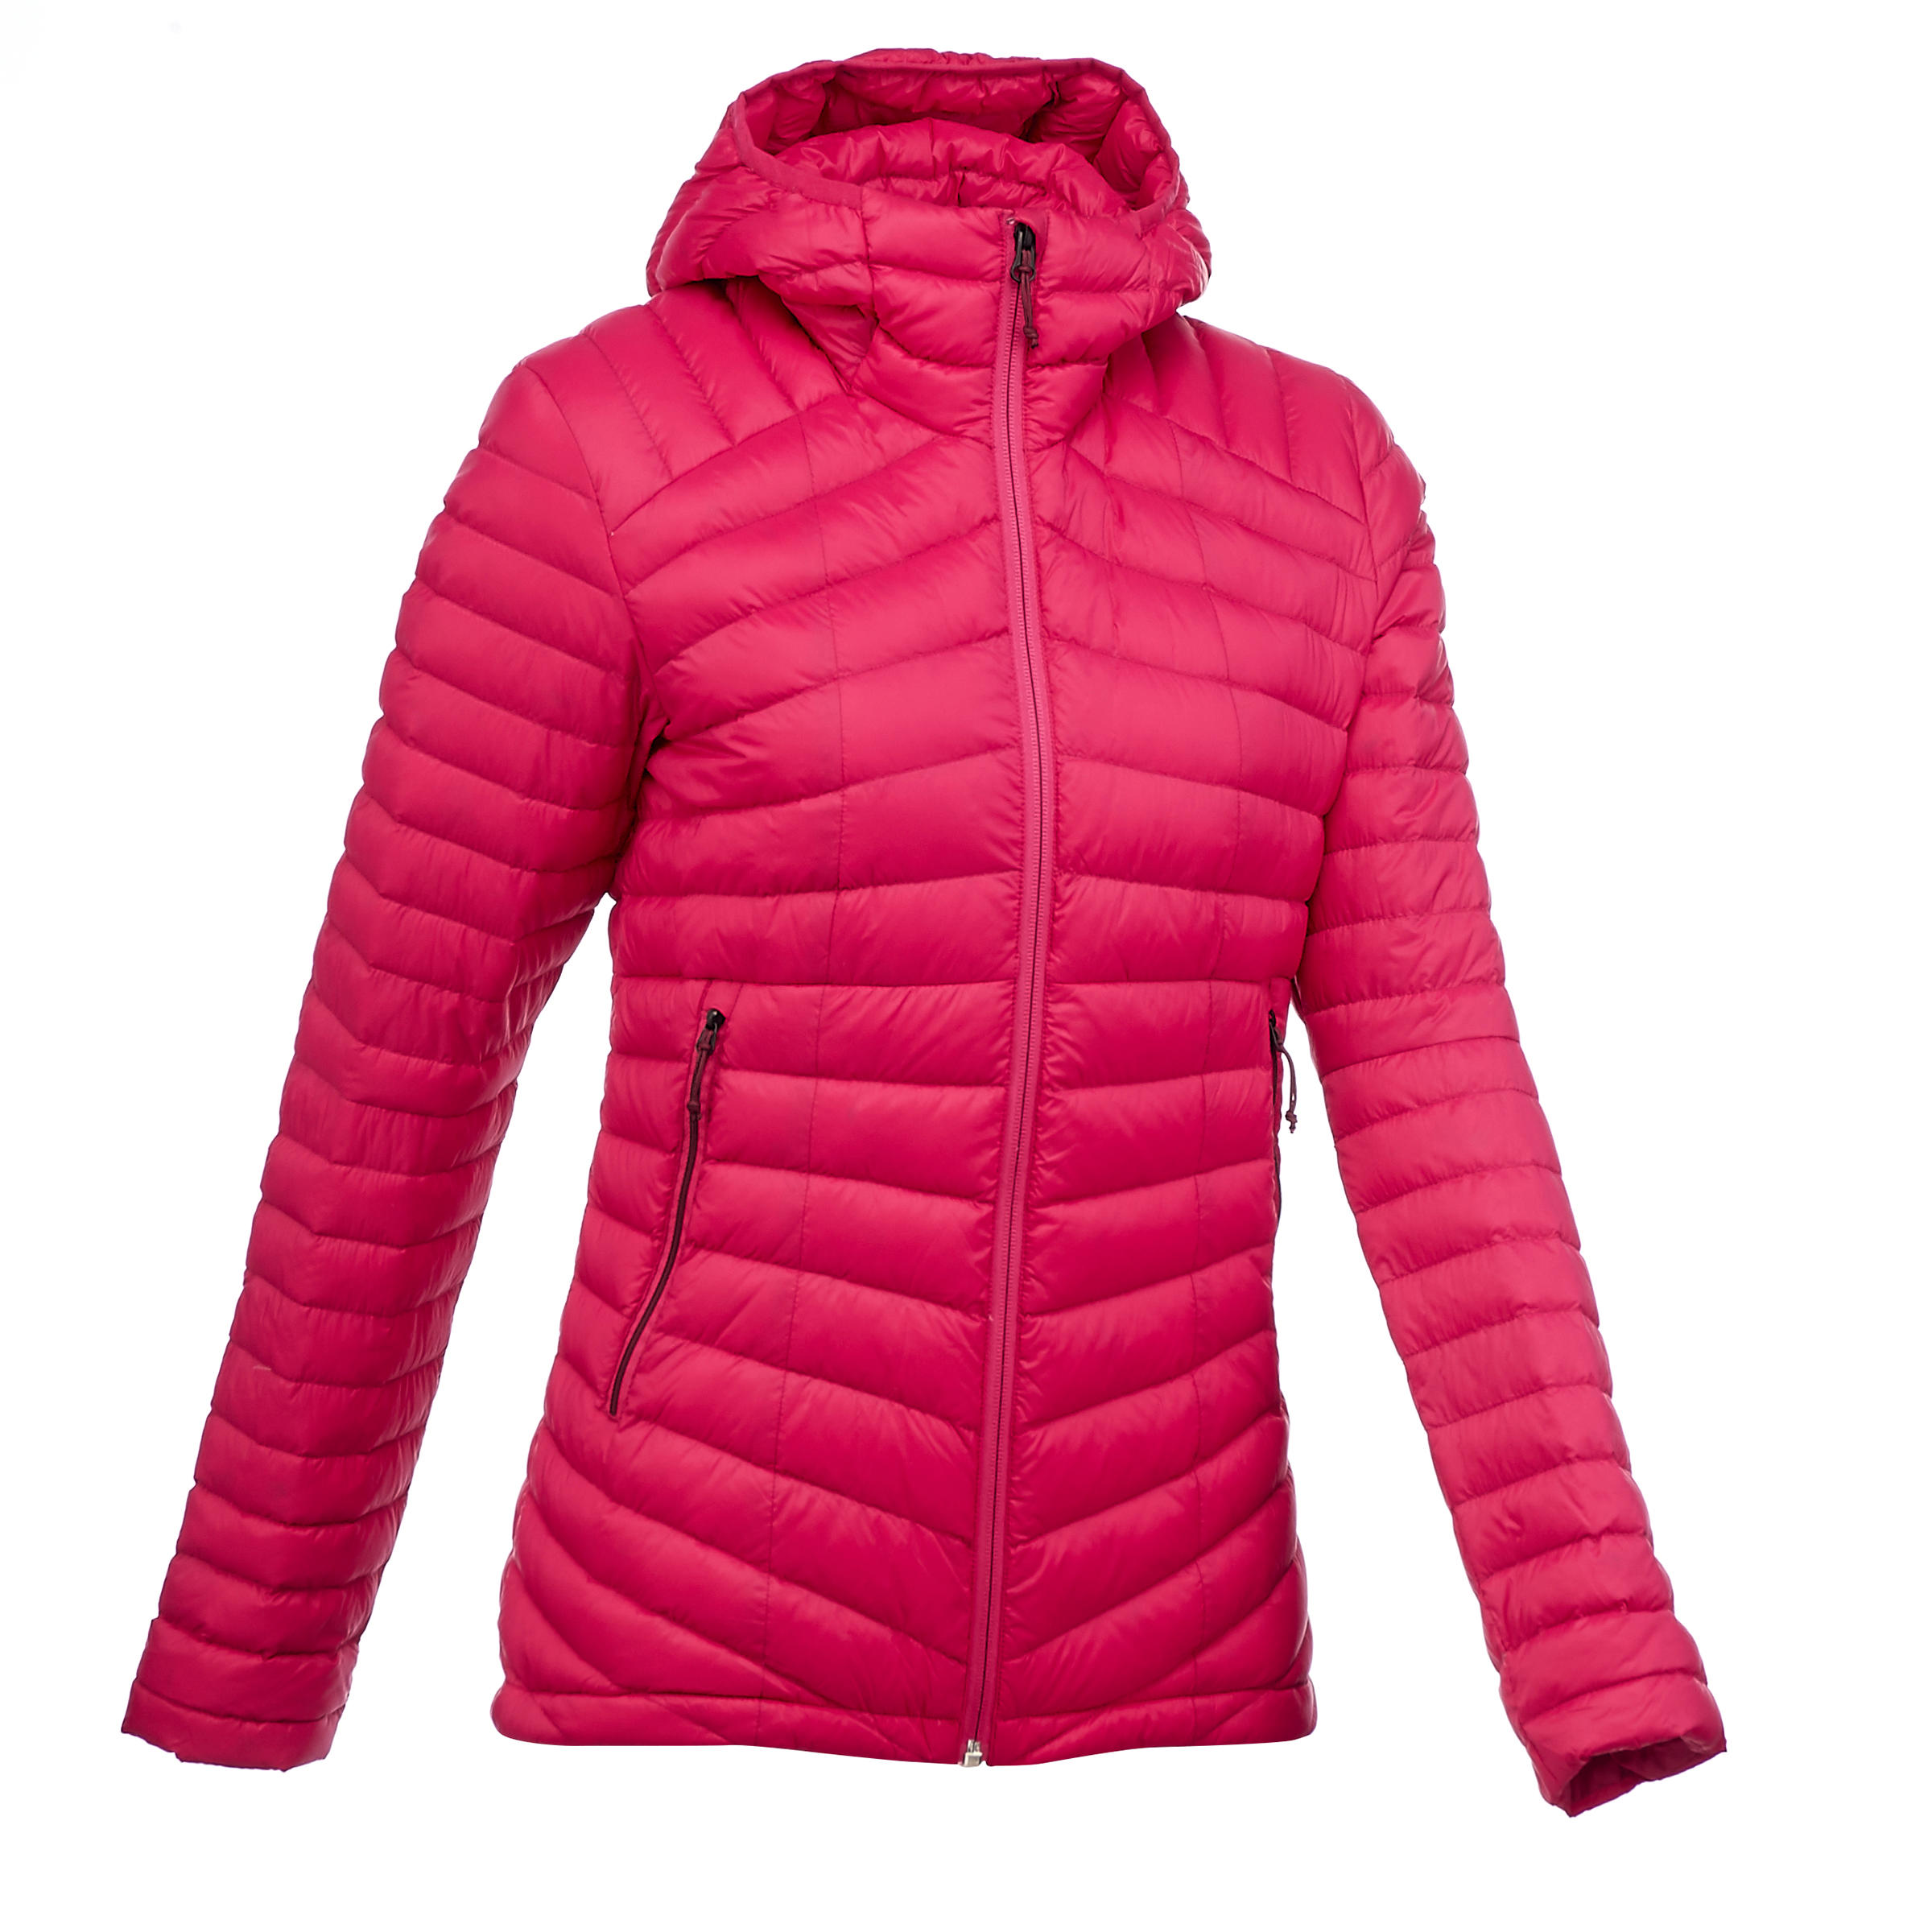 Chamarra acolchada de trekking Full Down mujer rosa